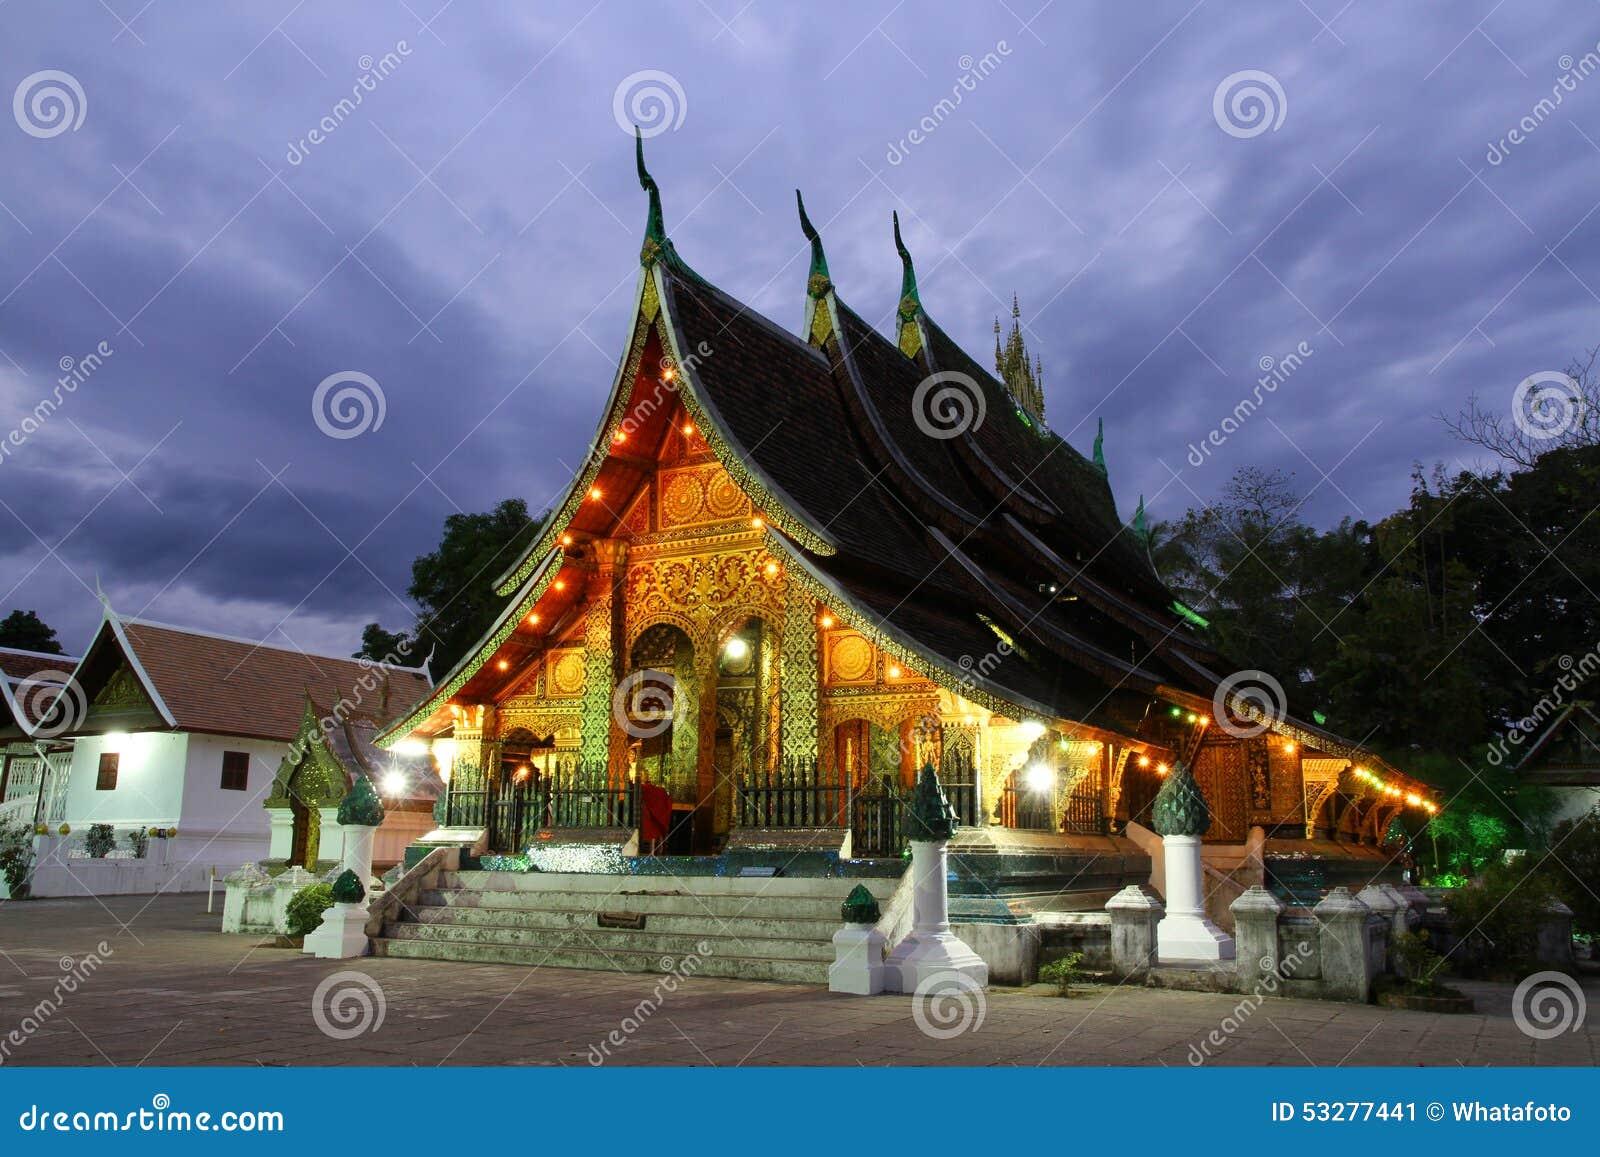 Download Colorful Wat Xieng Thong Temple At Dusk In Luang Prabang, Loas Stock Image - Image of background, grey: 53277441